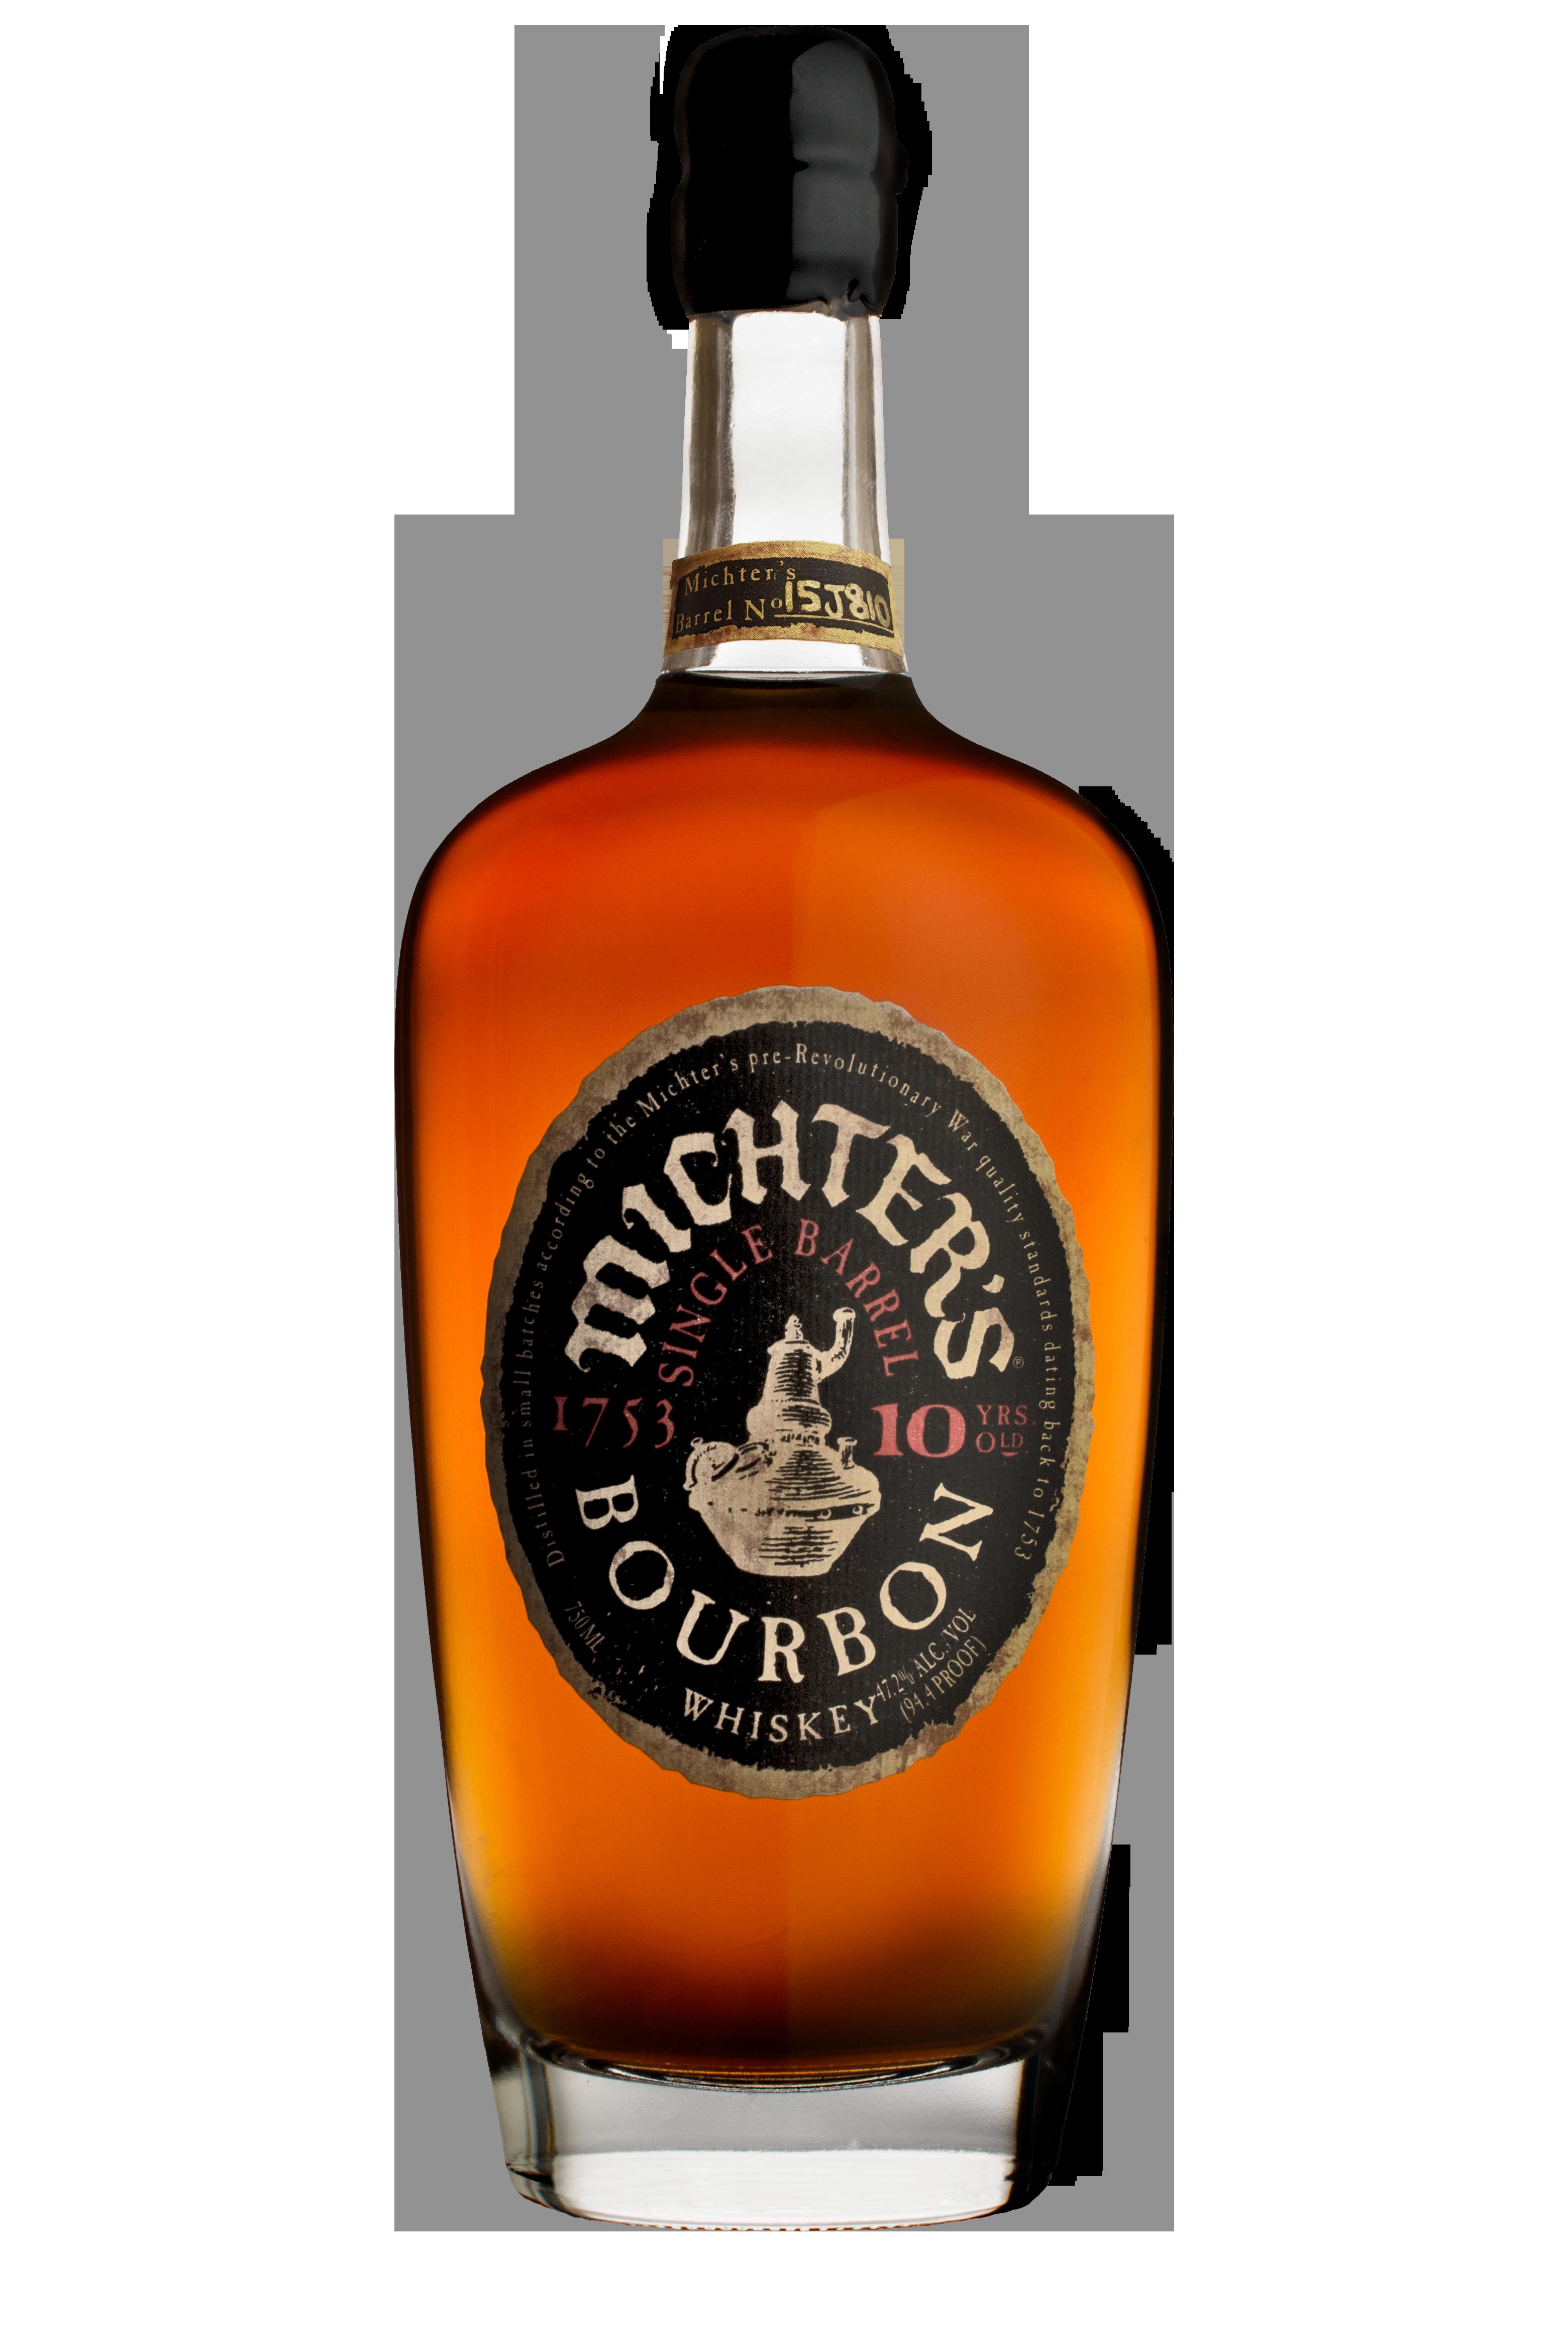 Michter's Single Barrel Bourbon 10 Years Old 2015